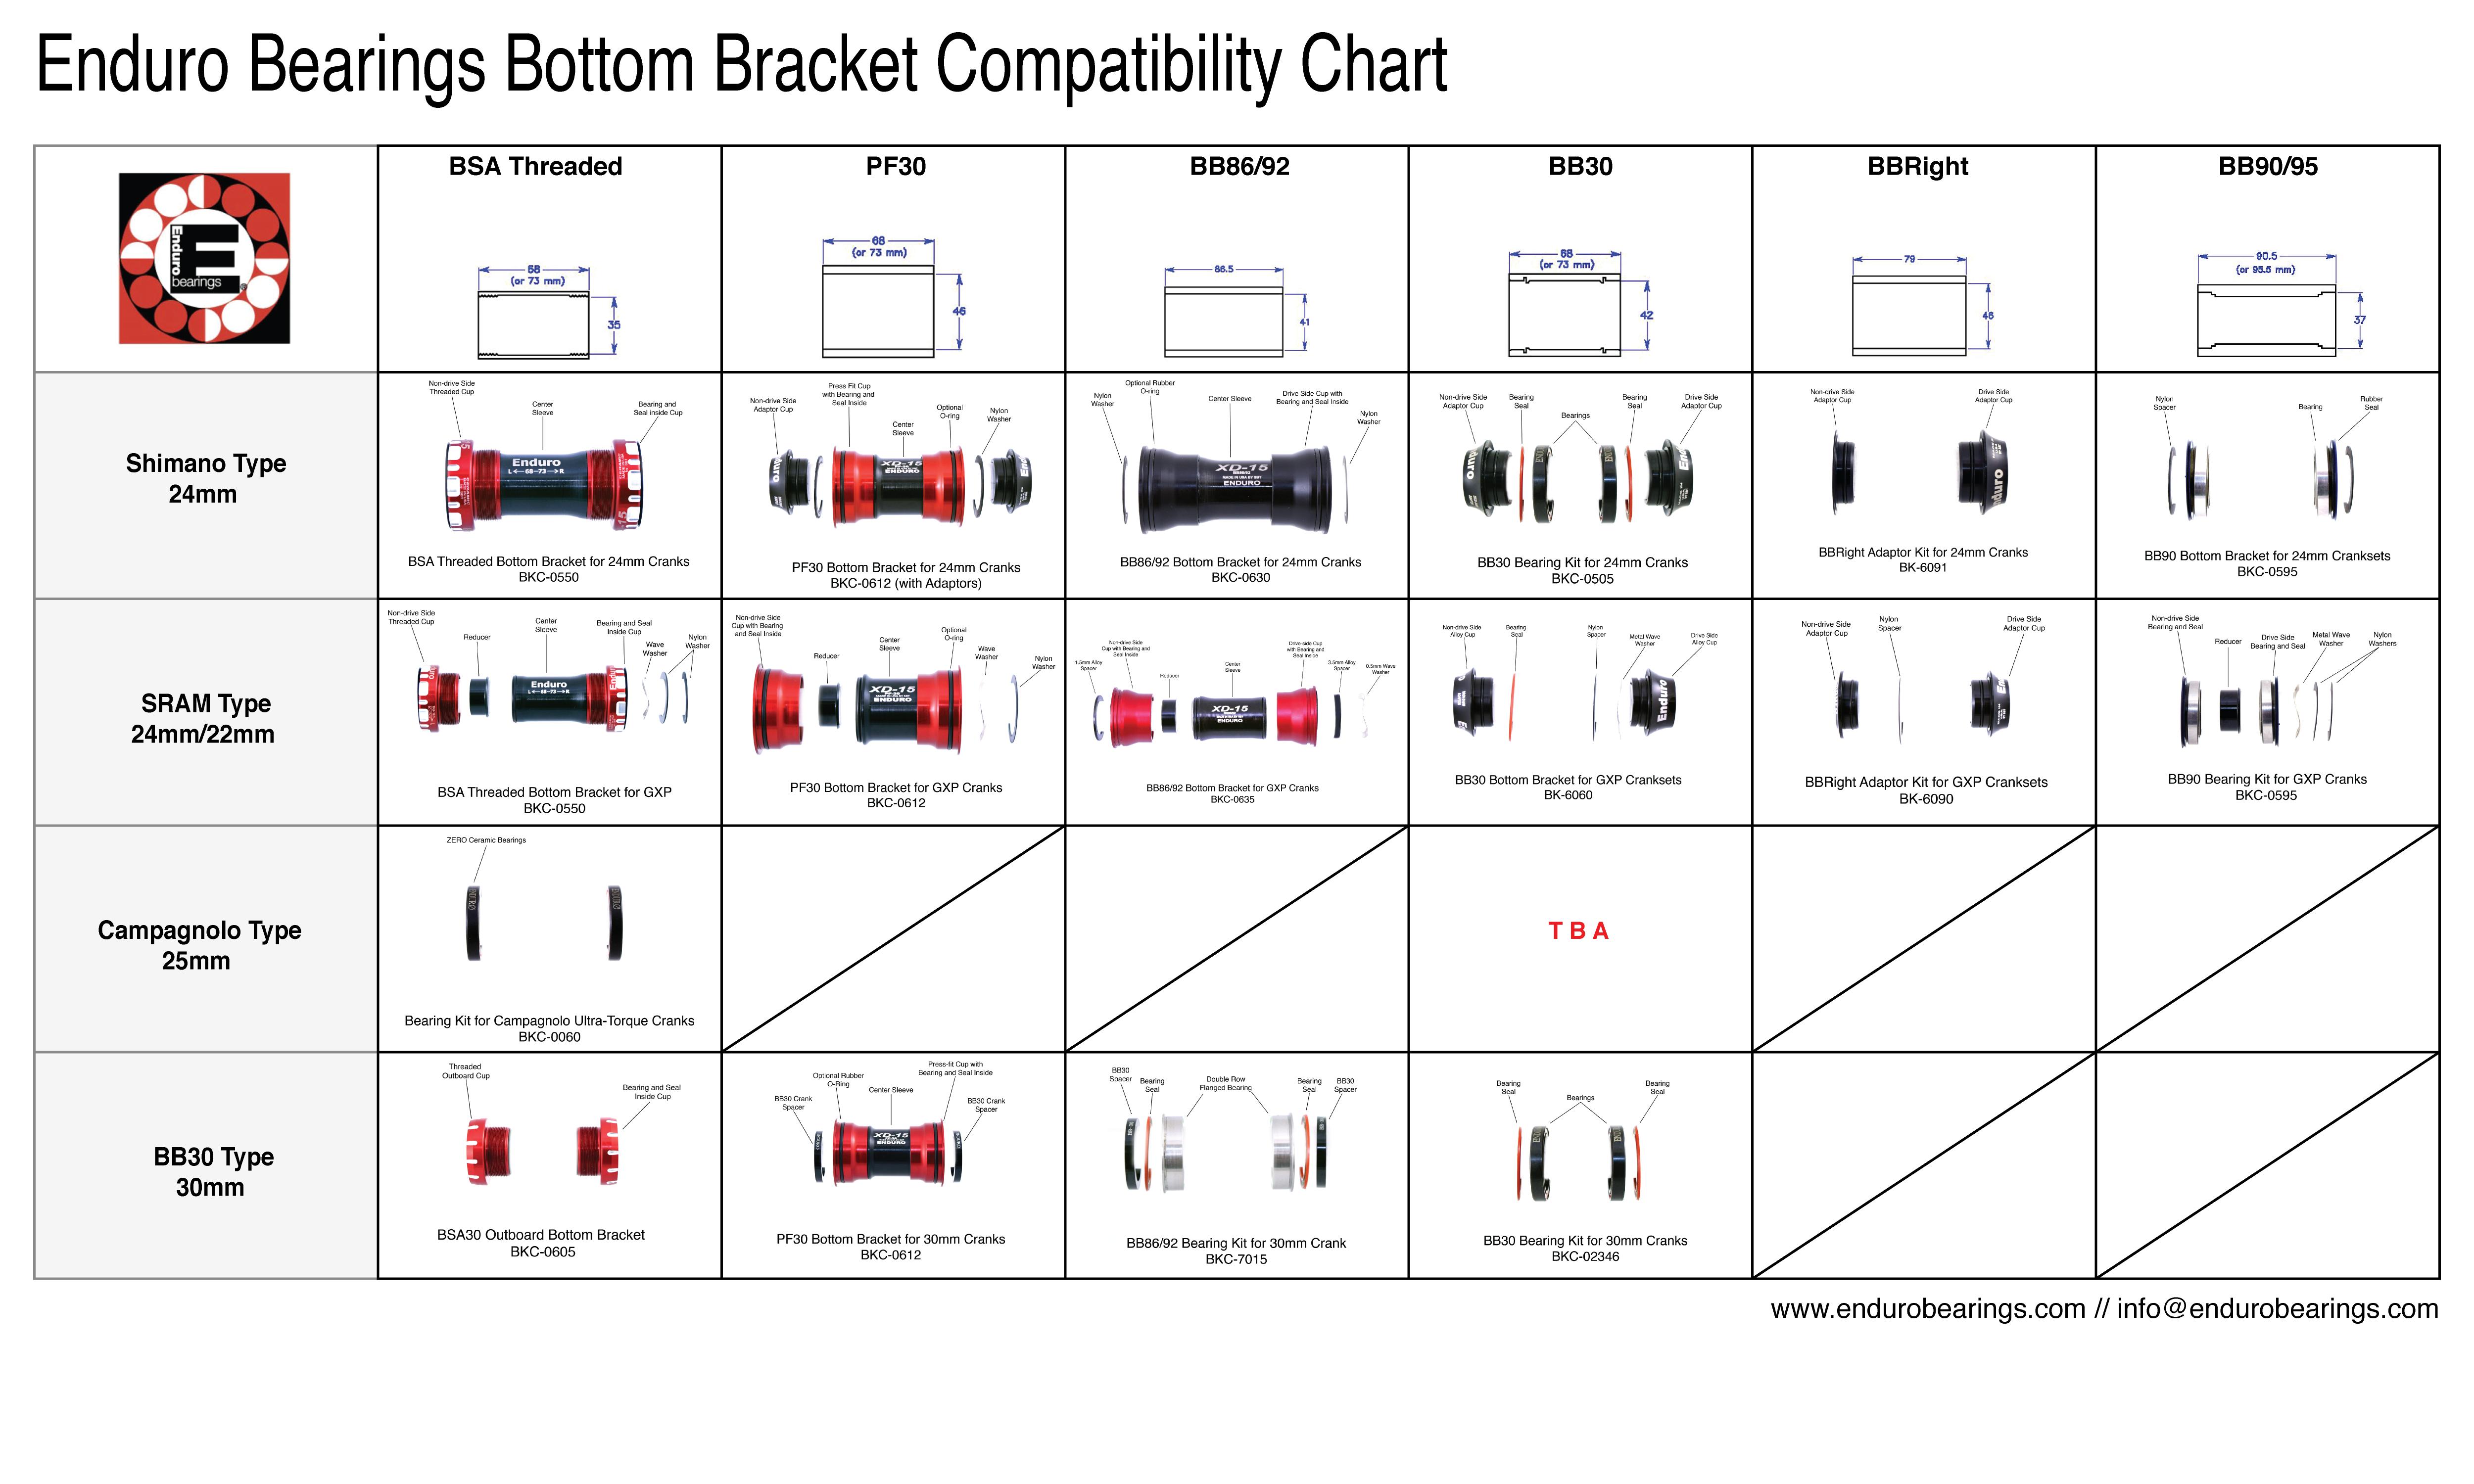 Compatibility Charts Enduro Bearings